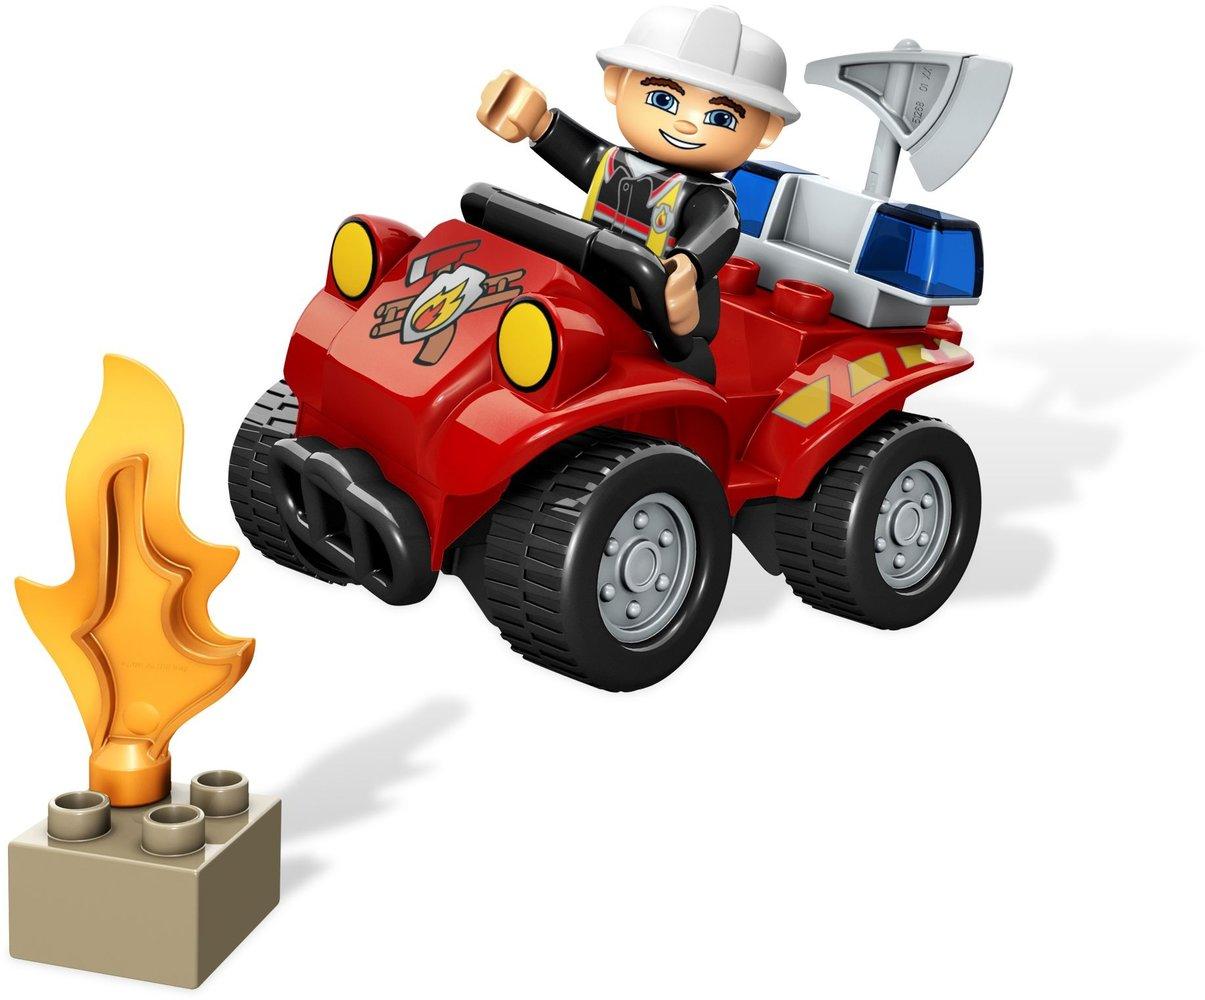 Fire Chief (Fire Car)